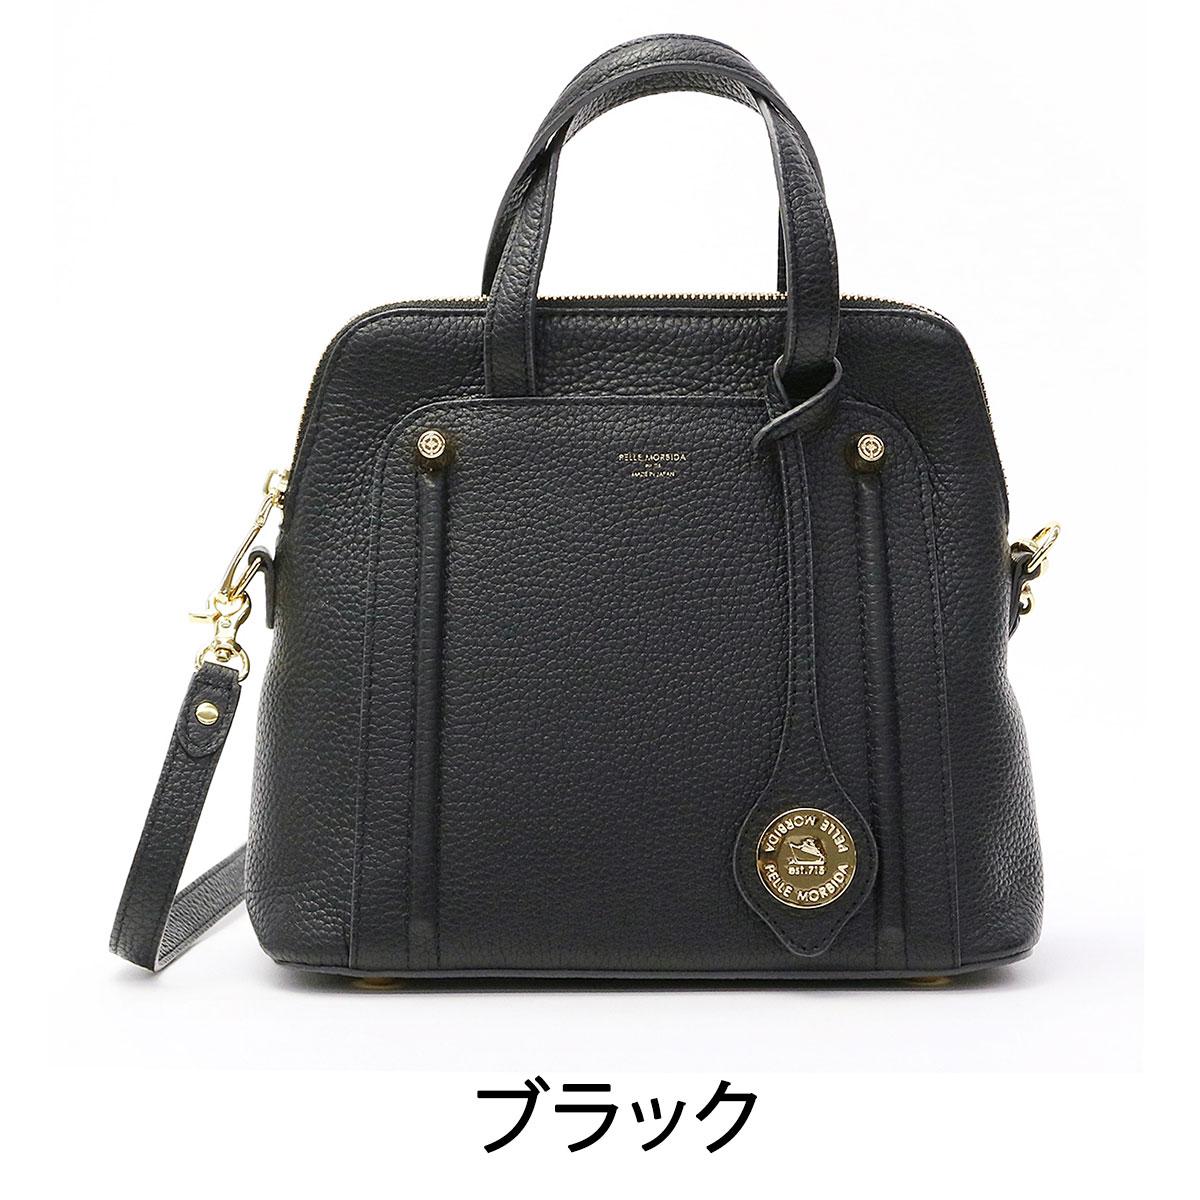 Handbag Pelle Morbida Vera Shoulder Bag Leather 2 Way Women S Ve001